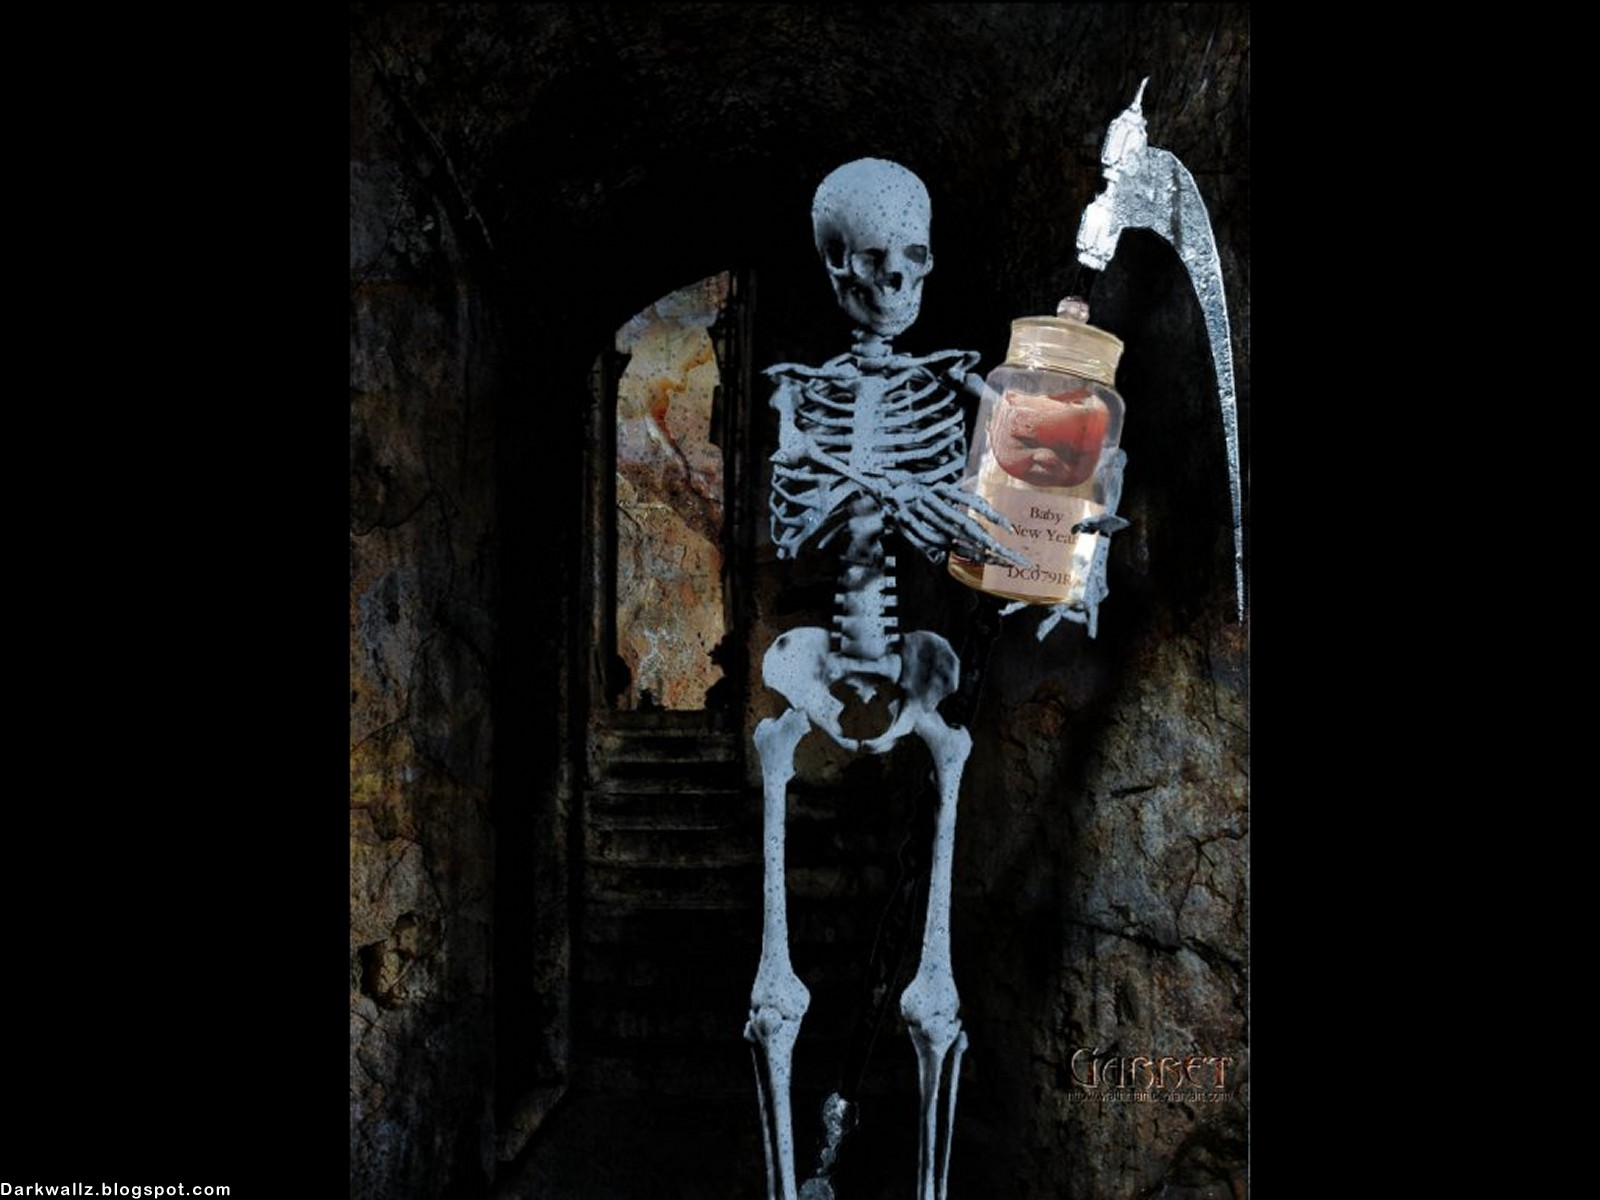 http://4.bp.blogspot.com/_-jo2ZCYhKaY/S62kQcN7RpI/AAAAAAAAHVM/U391N5EEIfg/s1600/Dark_Skulls_Wallpapers_100%2B(darkwallz.blogspot.com).jpg